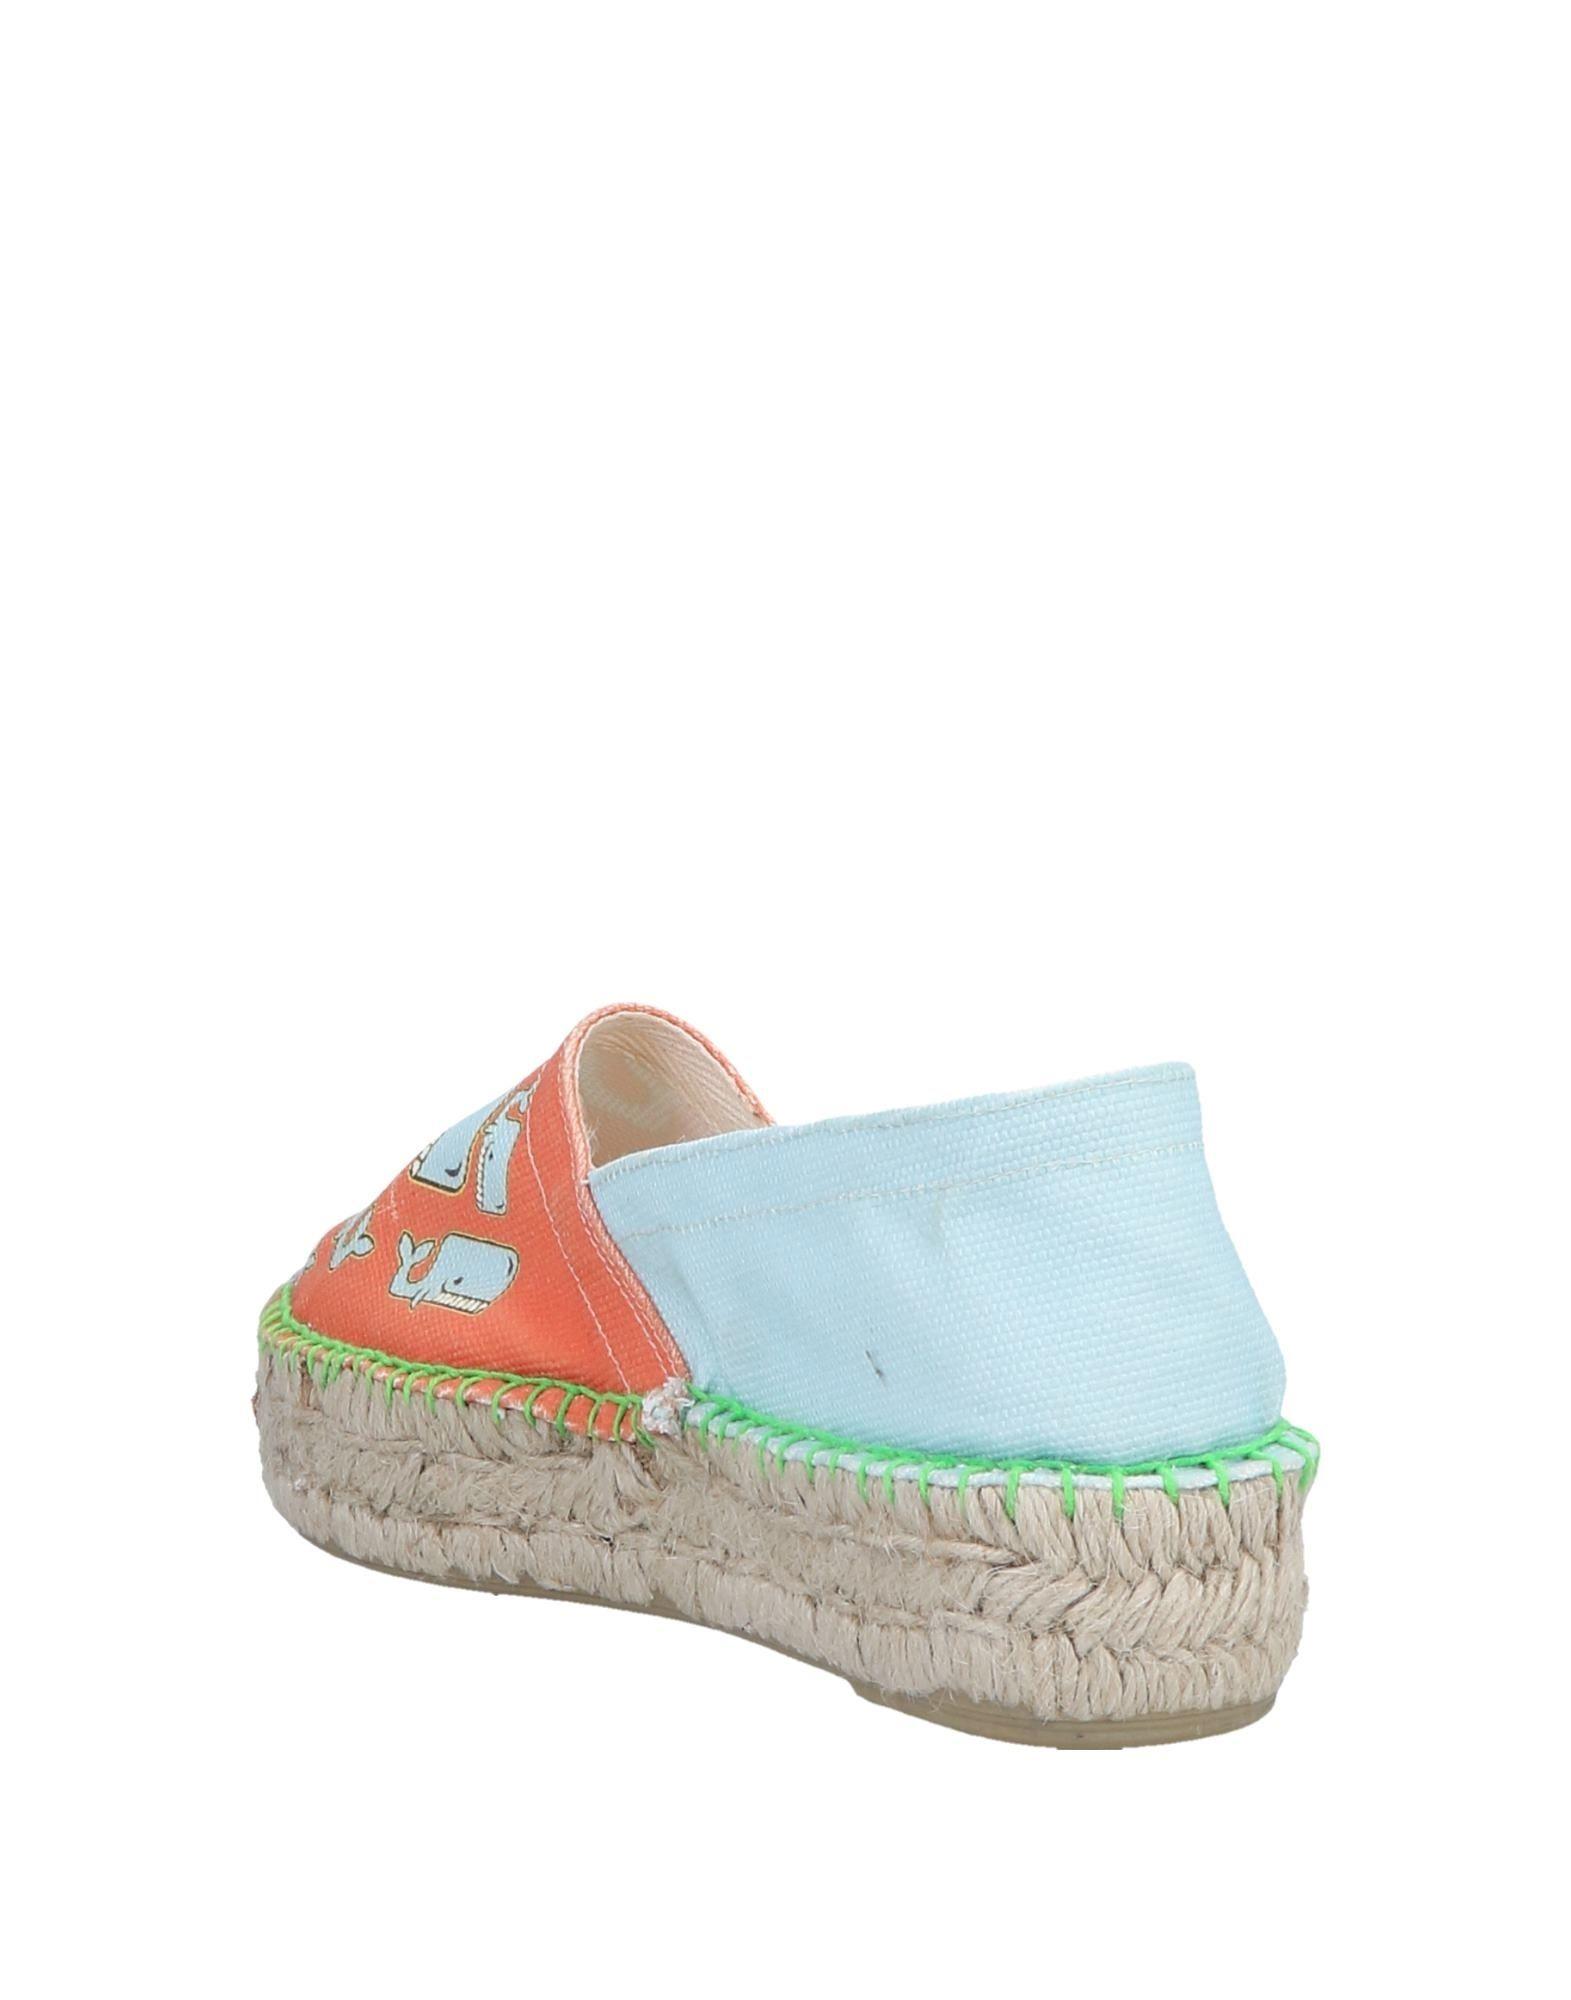 Leo Studio 11561555IV Design Espadrilles Damen  11561555IV Studio Gute Qualität beliebte Schuhe f93476